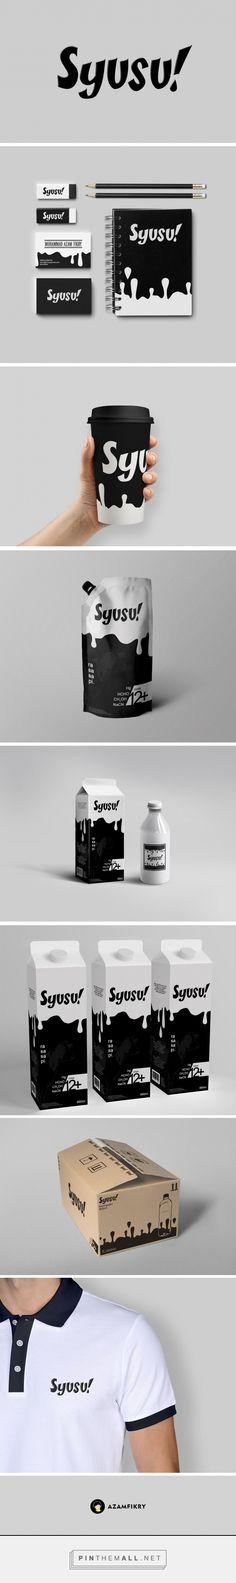 Milk branding and packaging. designer : Azam Fikry - created via https://pinthemall.net